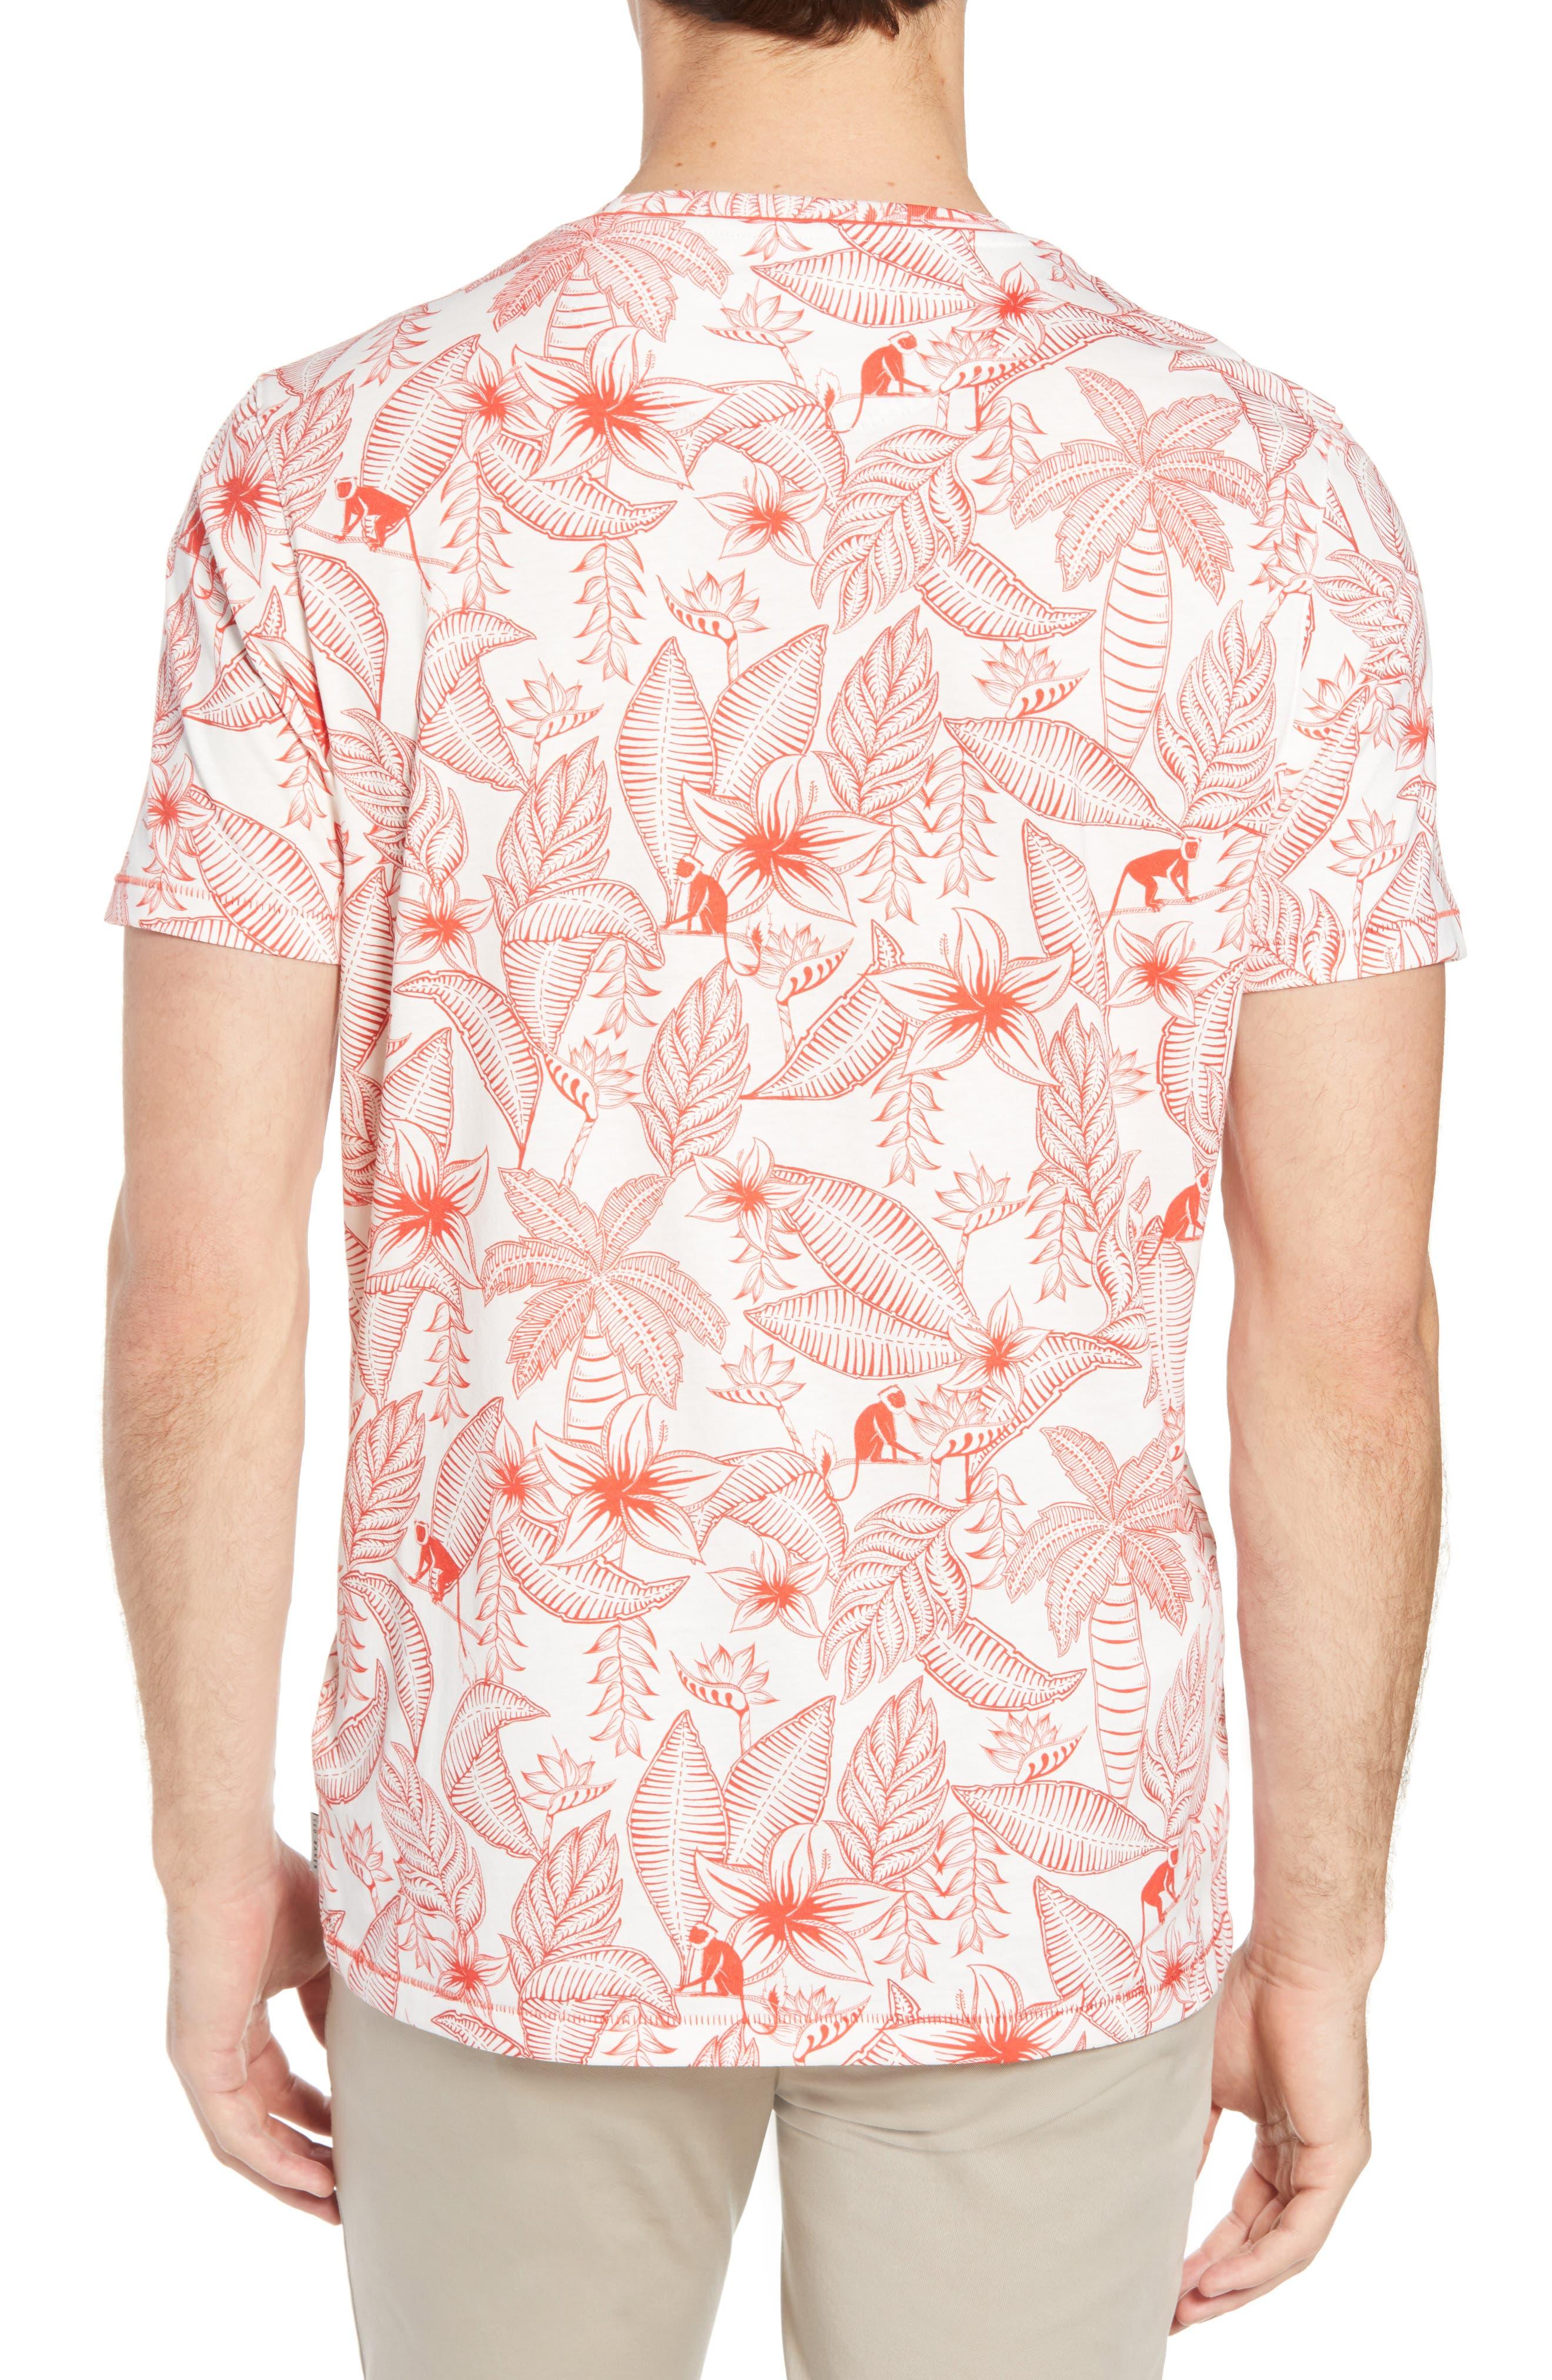 Bengel Crewneck T-Shirt,                             Alternate thumbnail 2, color,                             Red